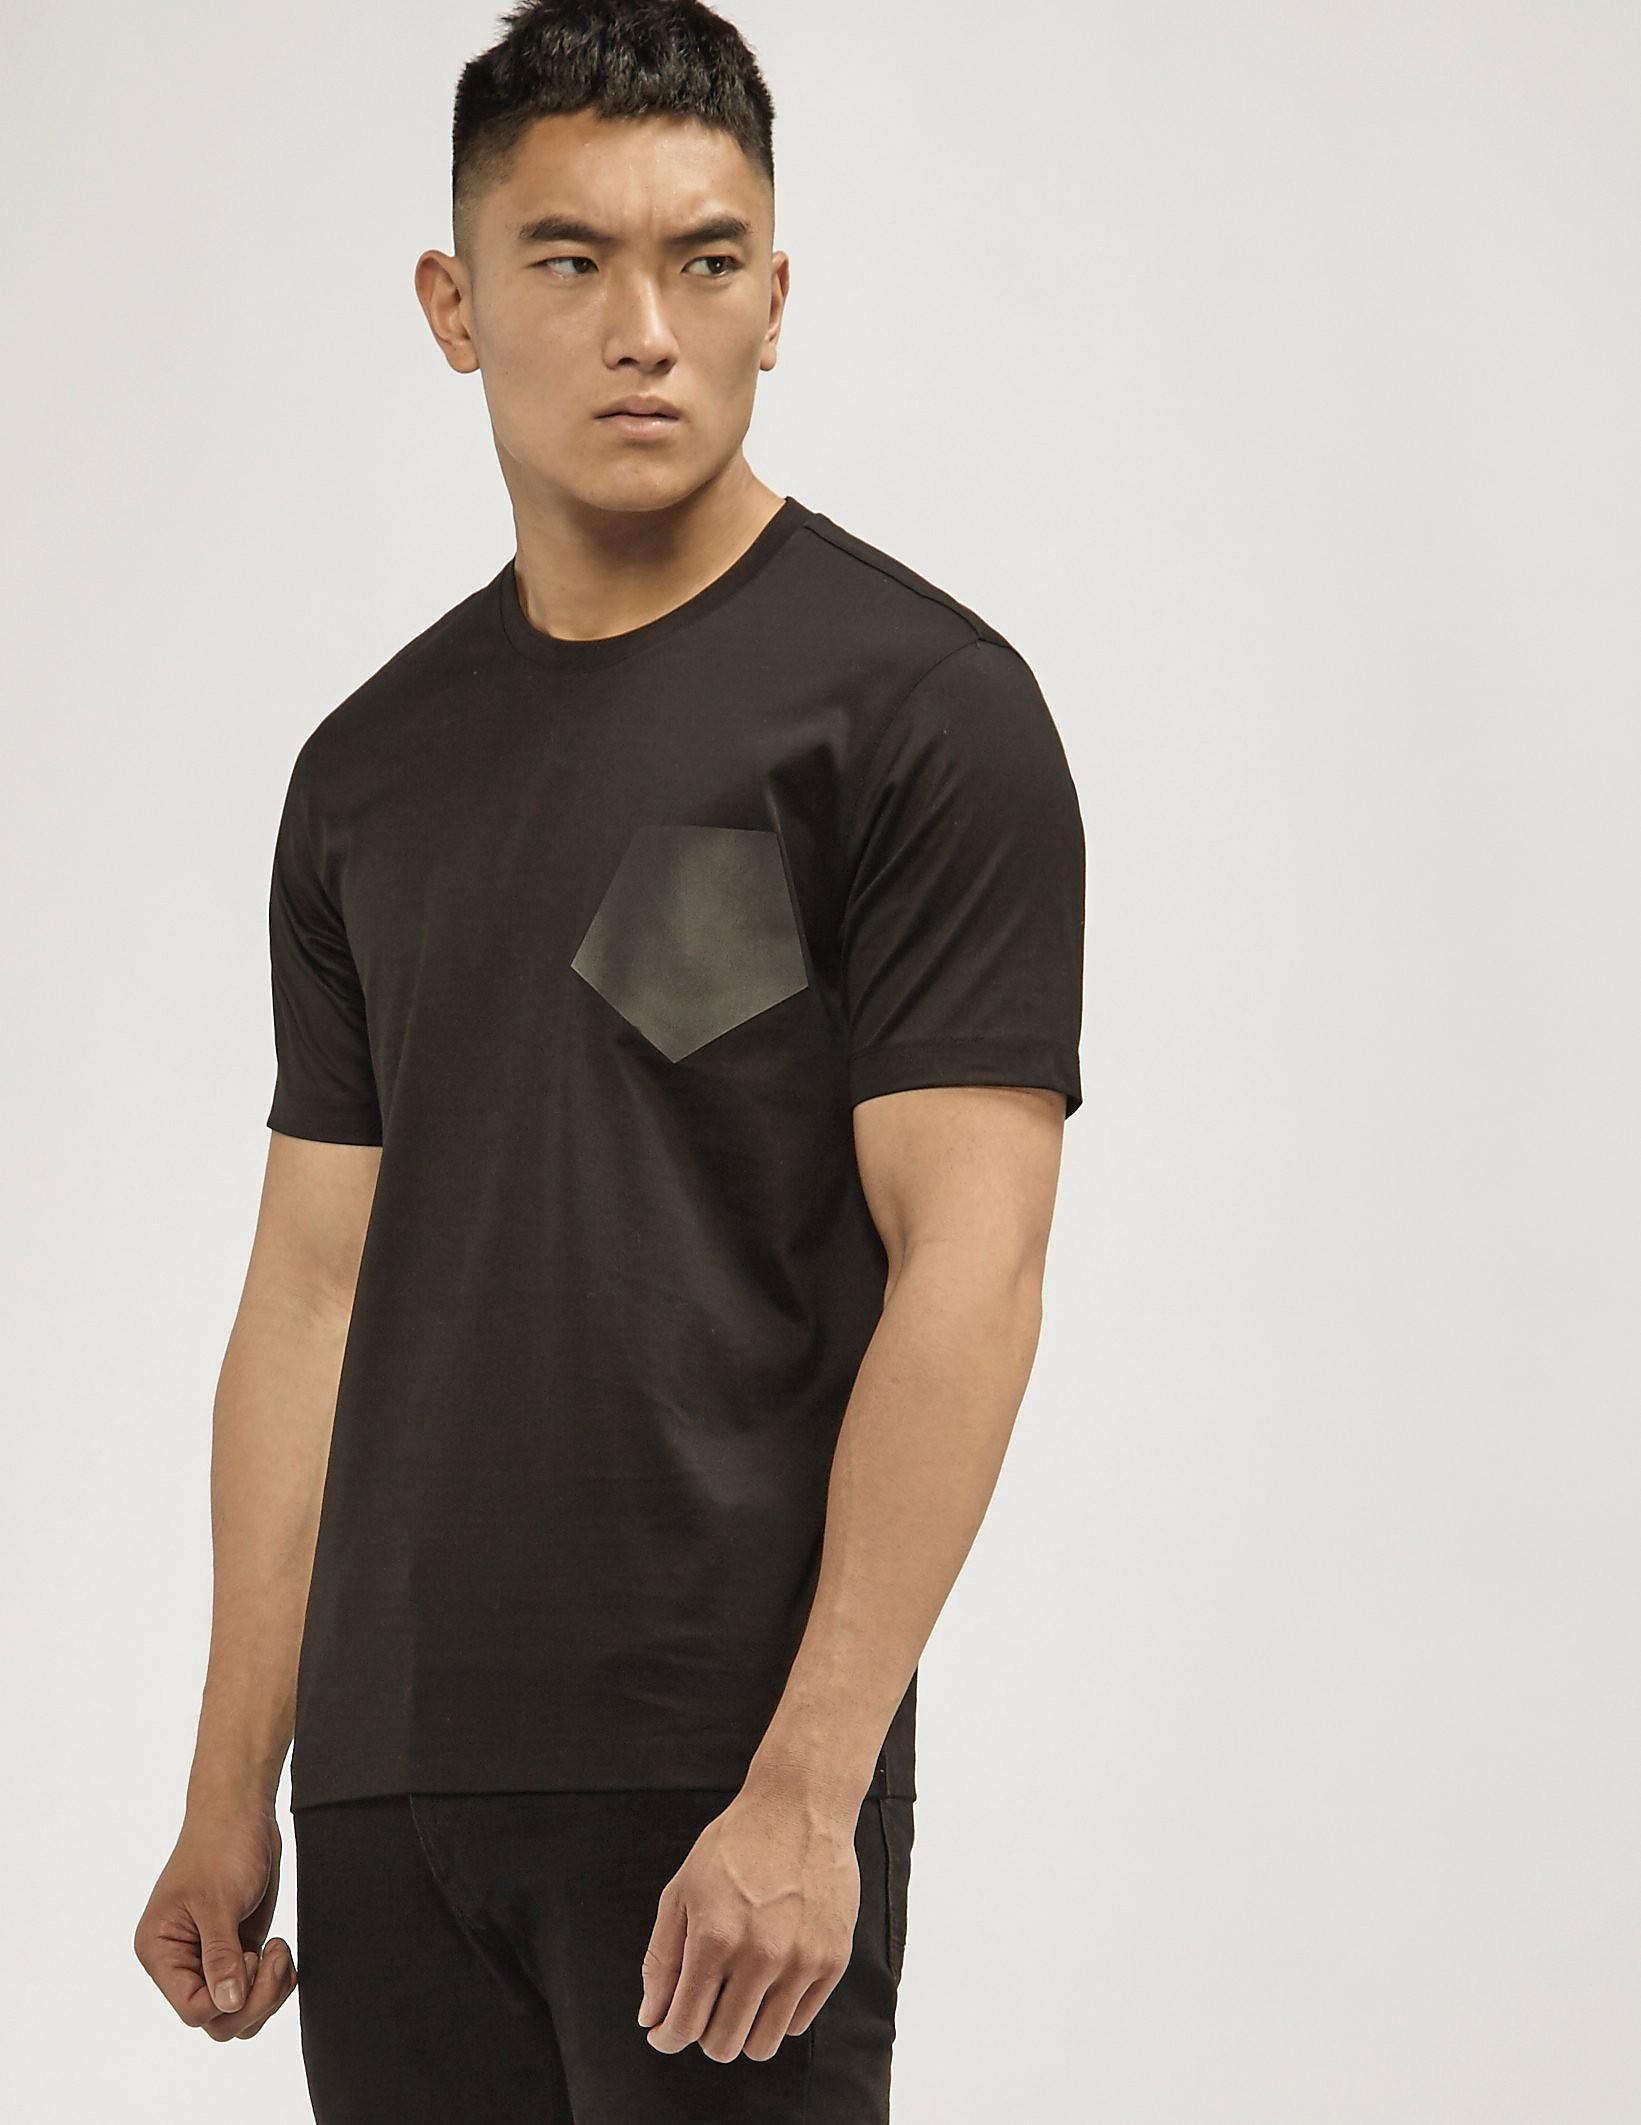 Z Zegna Chest Patch T-Shirt